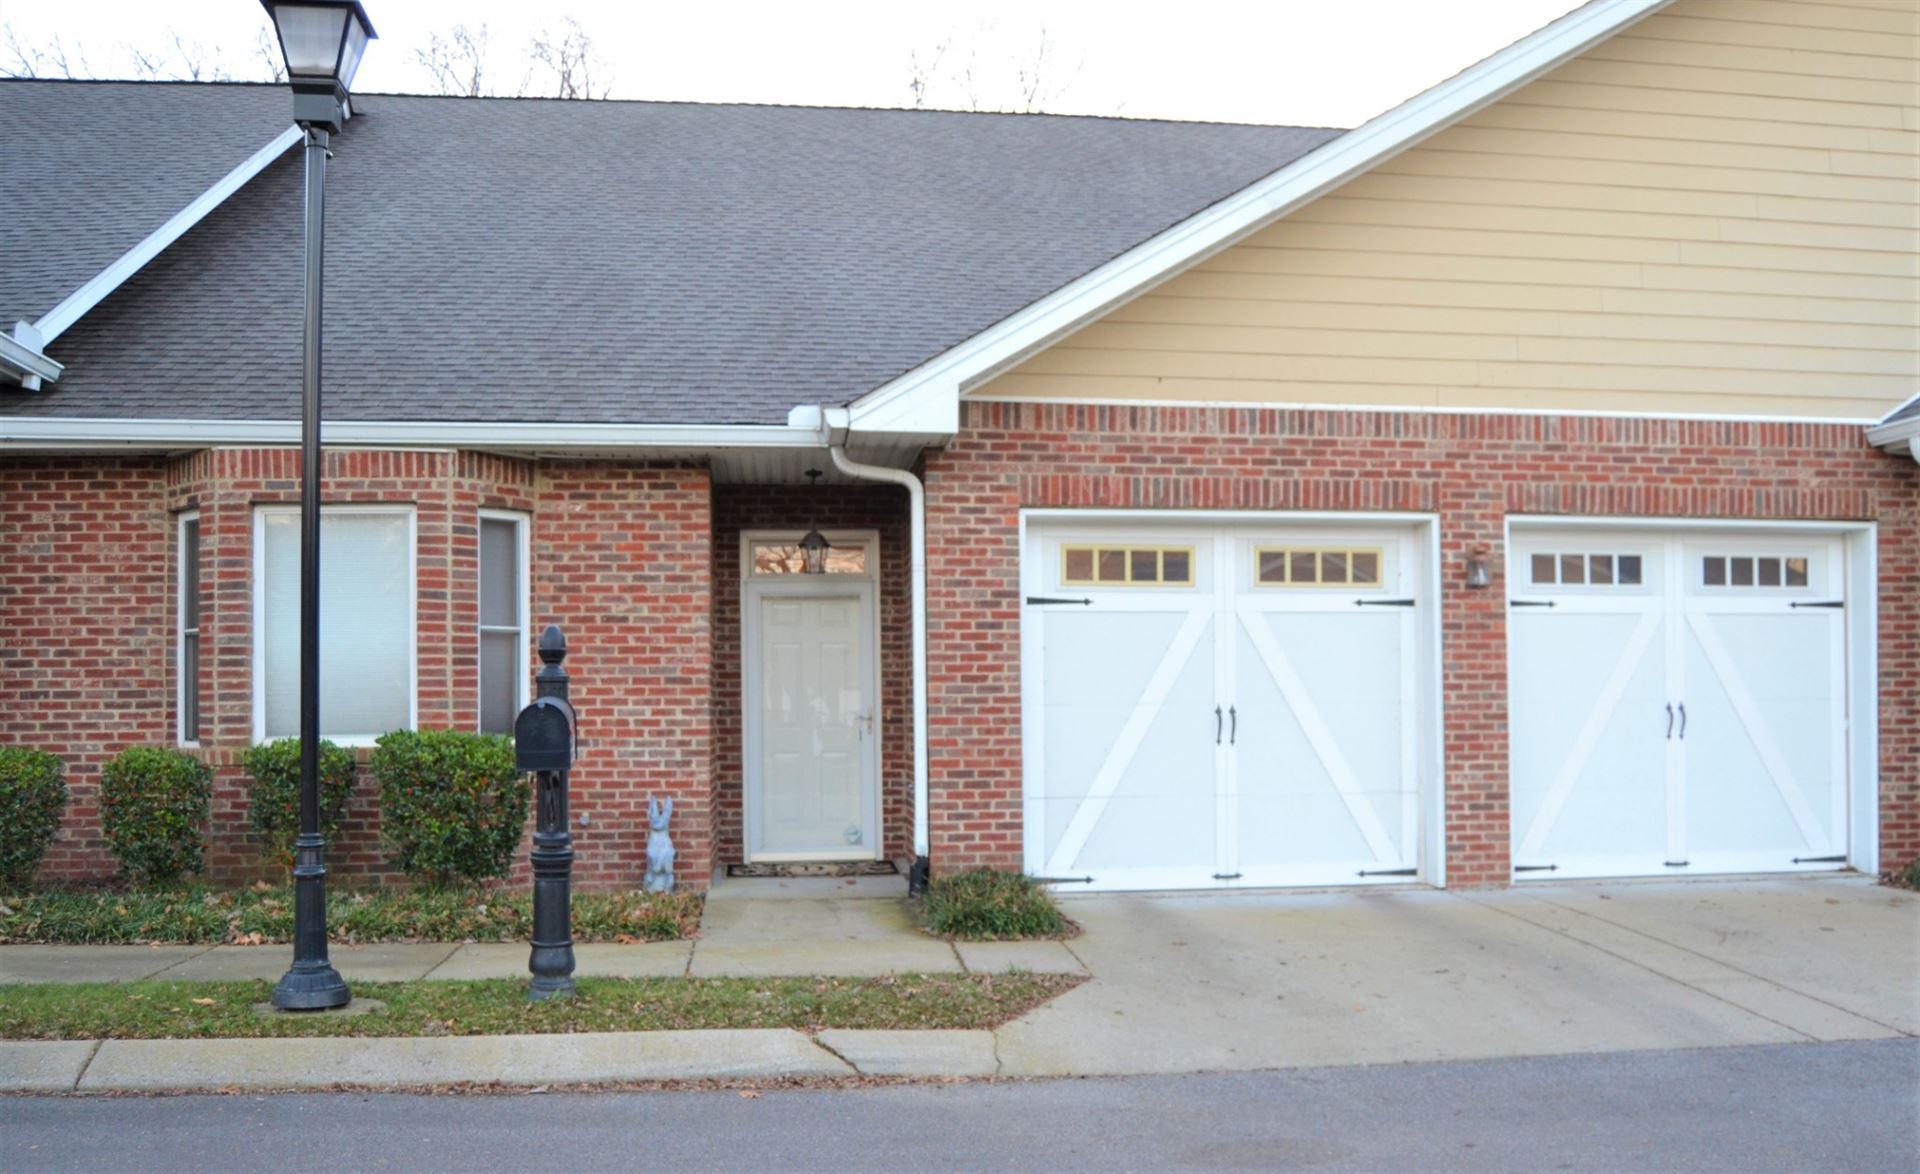 812 Cedarstone Way, Nashville, TN 37214 - MLS#: 2218469